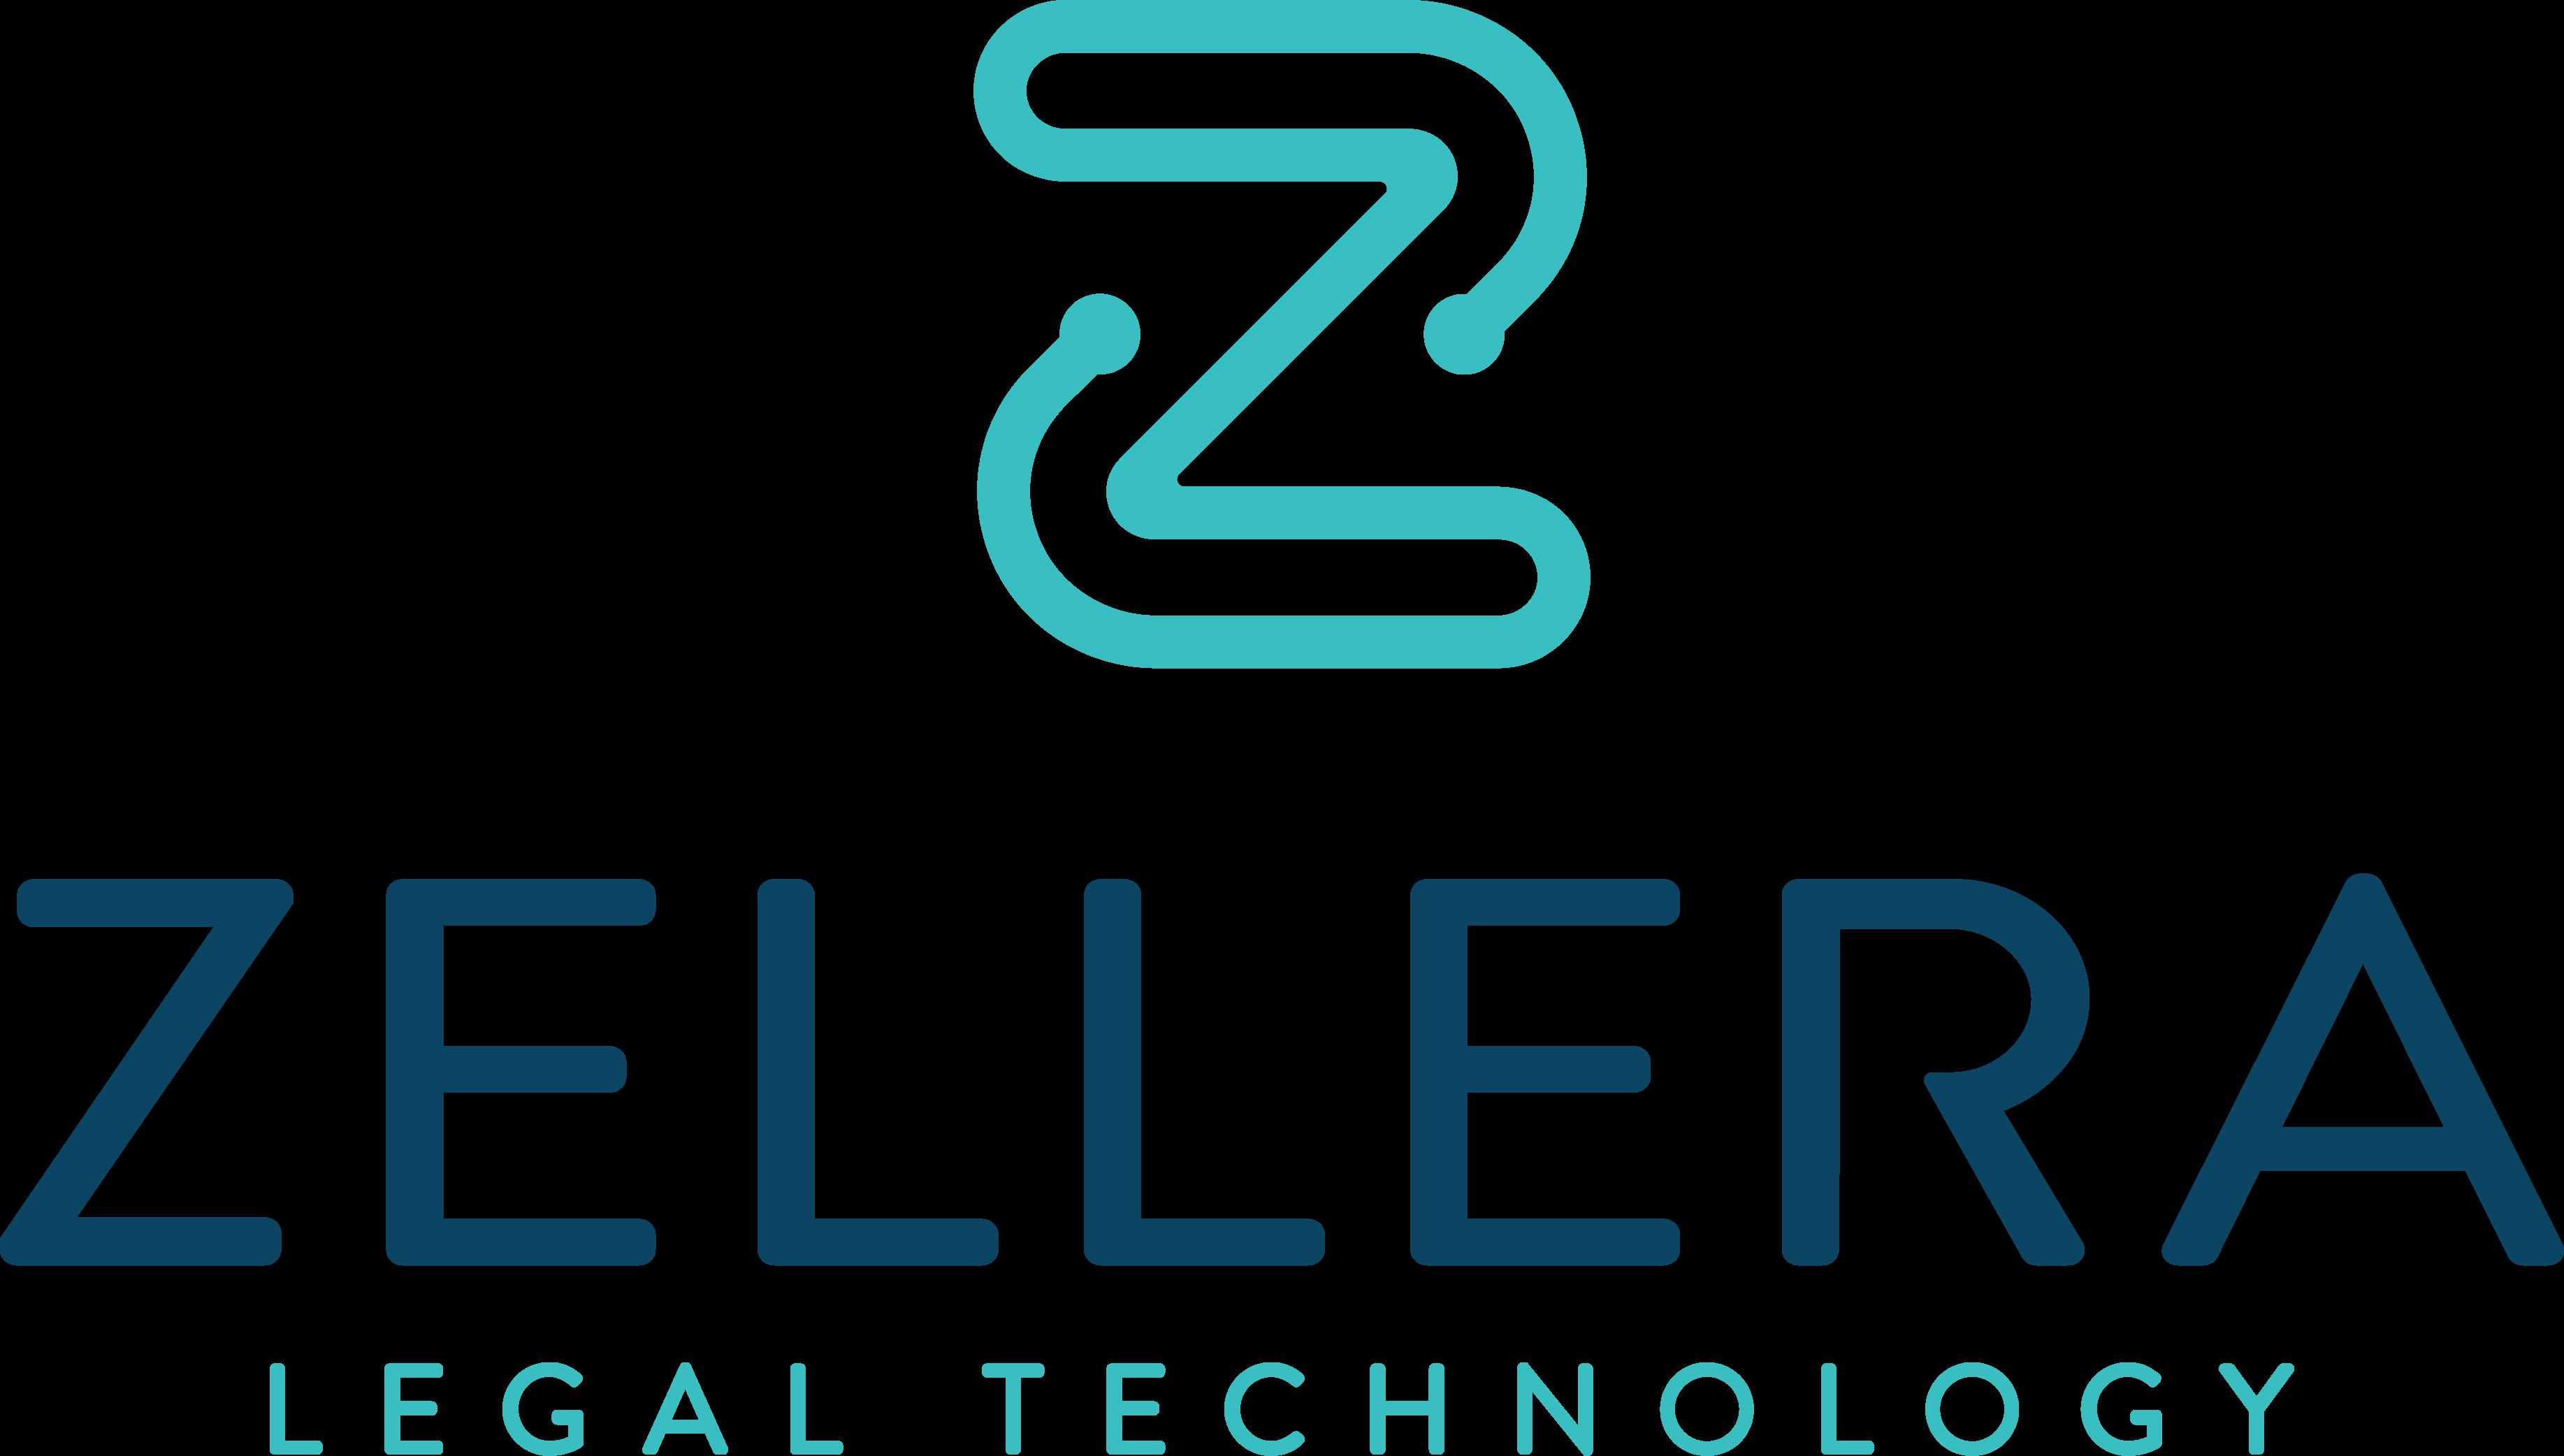 Zellera Legal Technology